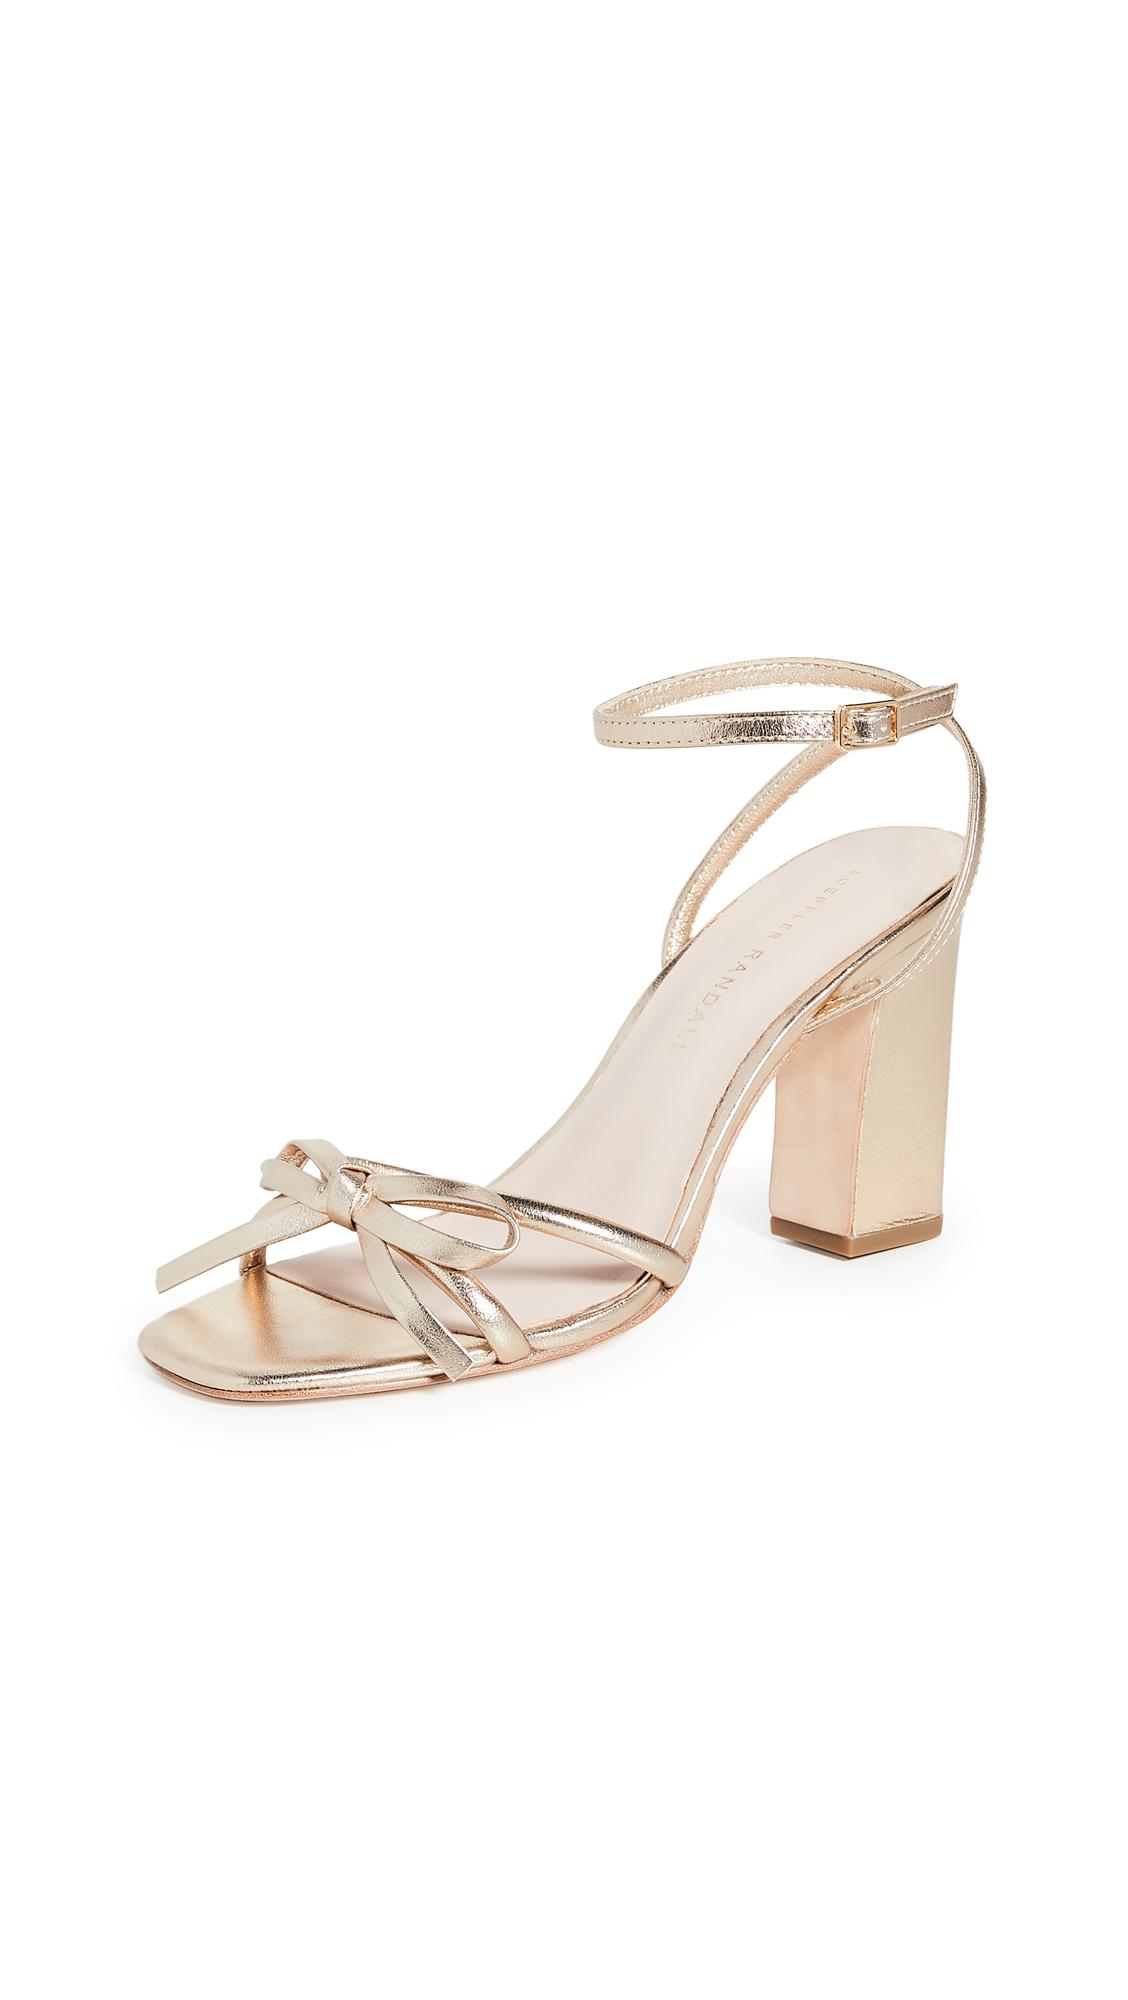 Loeffler Randall Maeve Knot Bow Ankle Strap Heel Sandals - 40% Off Sale